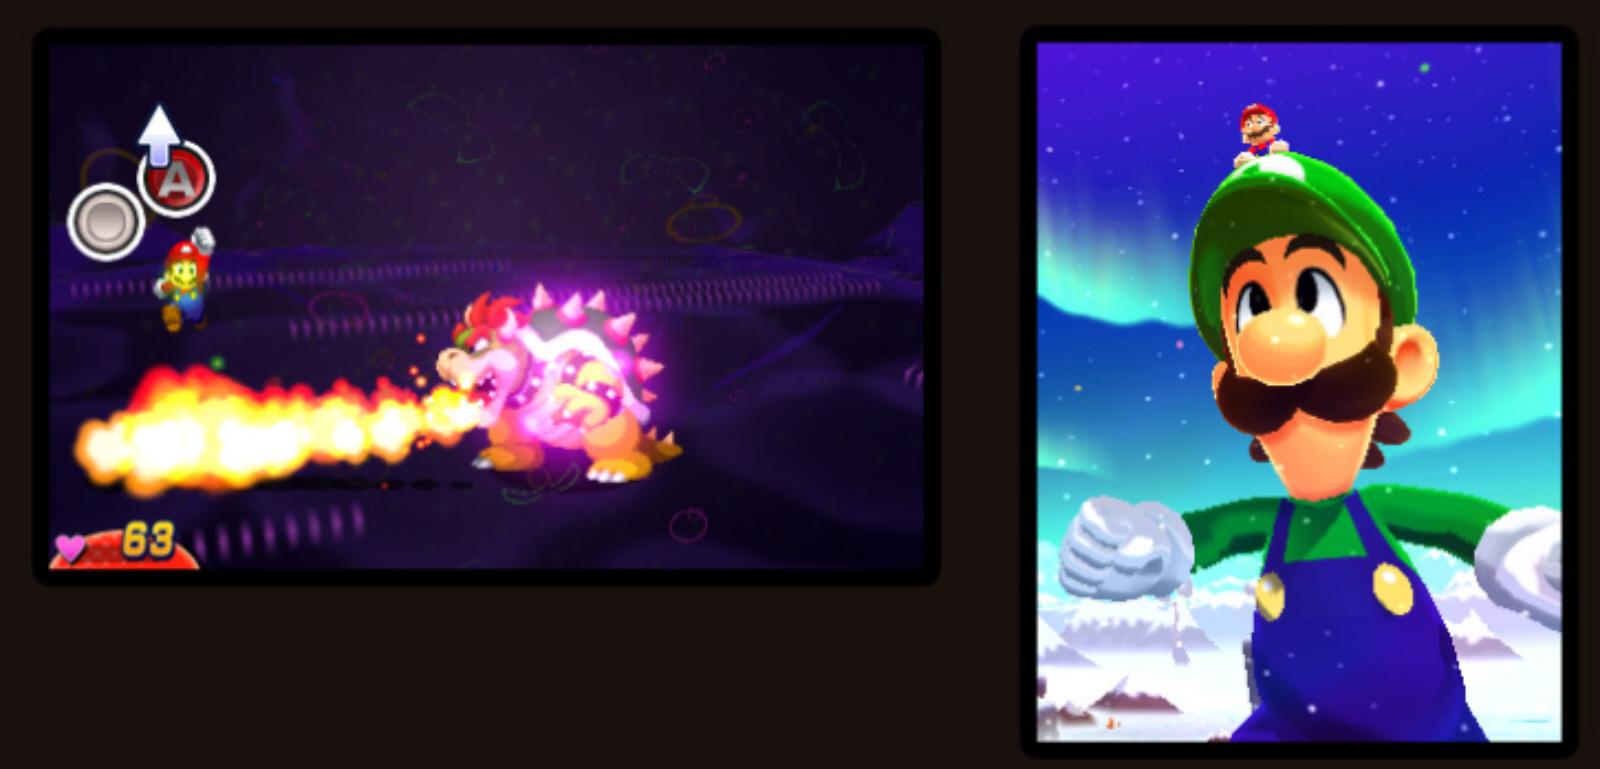 [Top 10] - Nintendo 3ds Mario-and-luigi-4-dream-team-giant-luigi-gameplay-screenshot